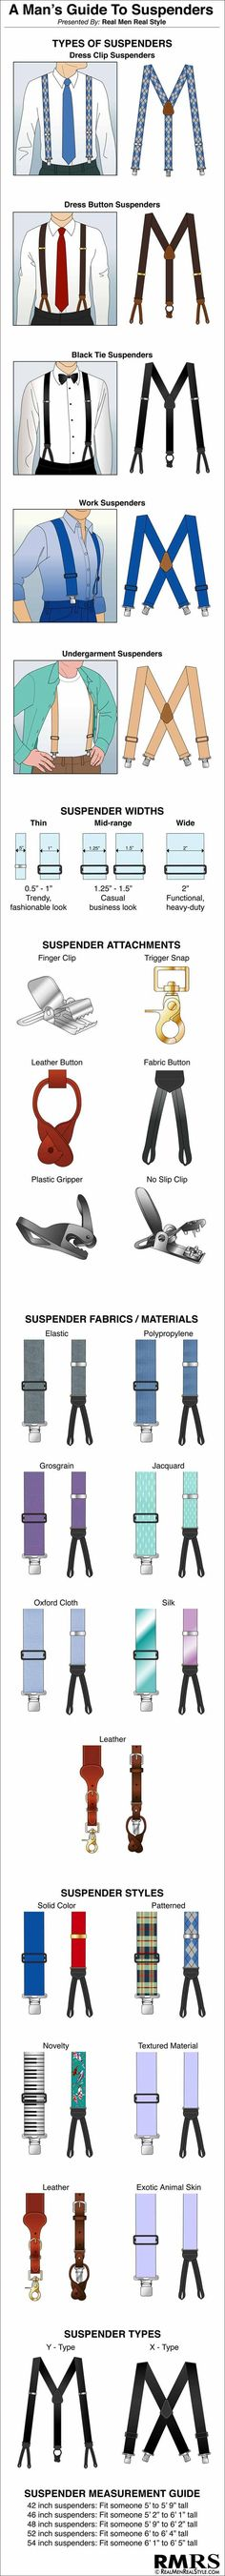 For you suspender men! #mensfashion #mensstyle #fashion #style #fashionmagenet #suspenders